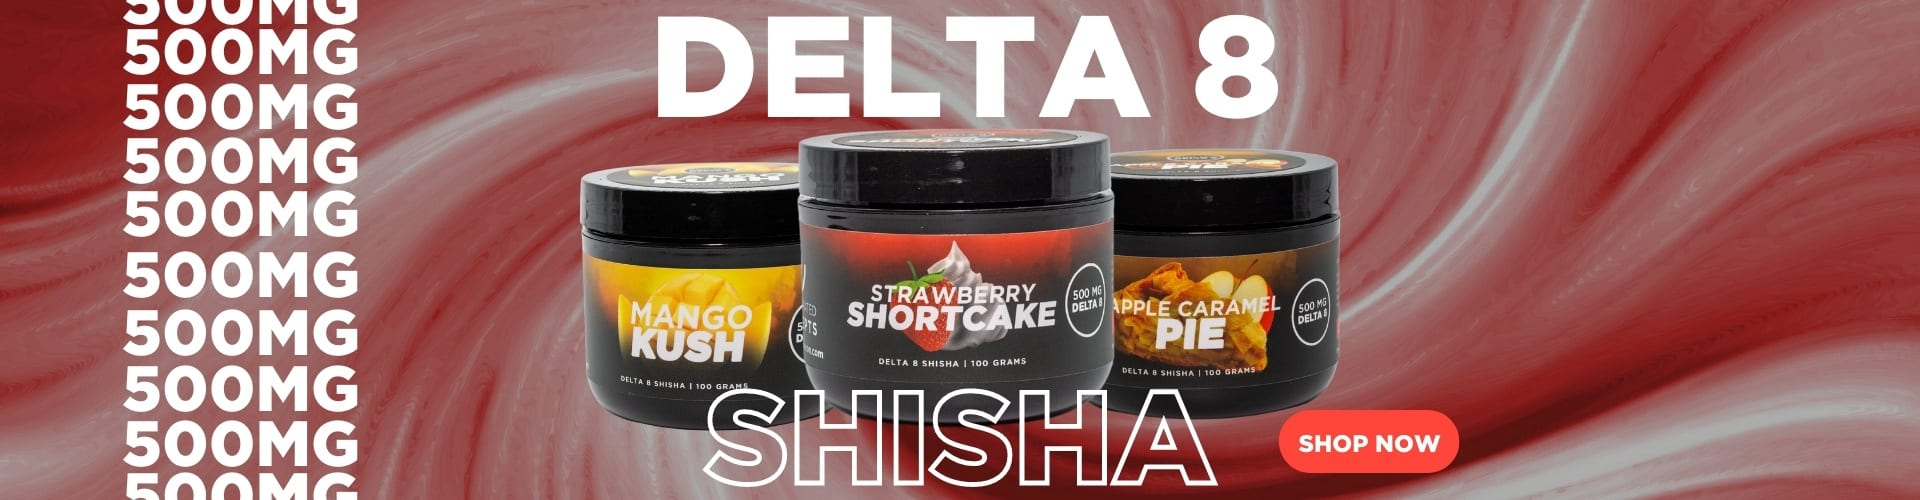 Delta 8 Shisha